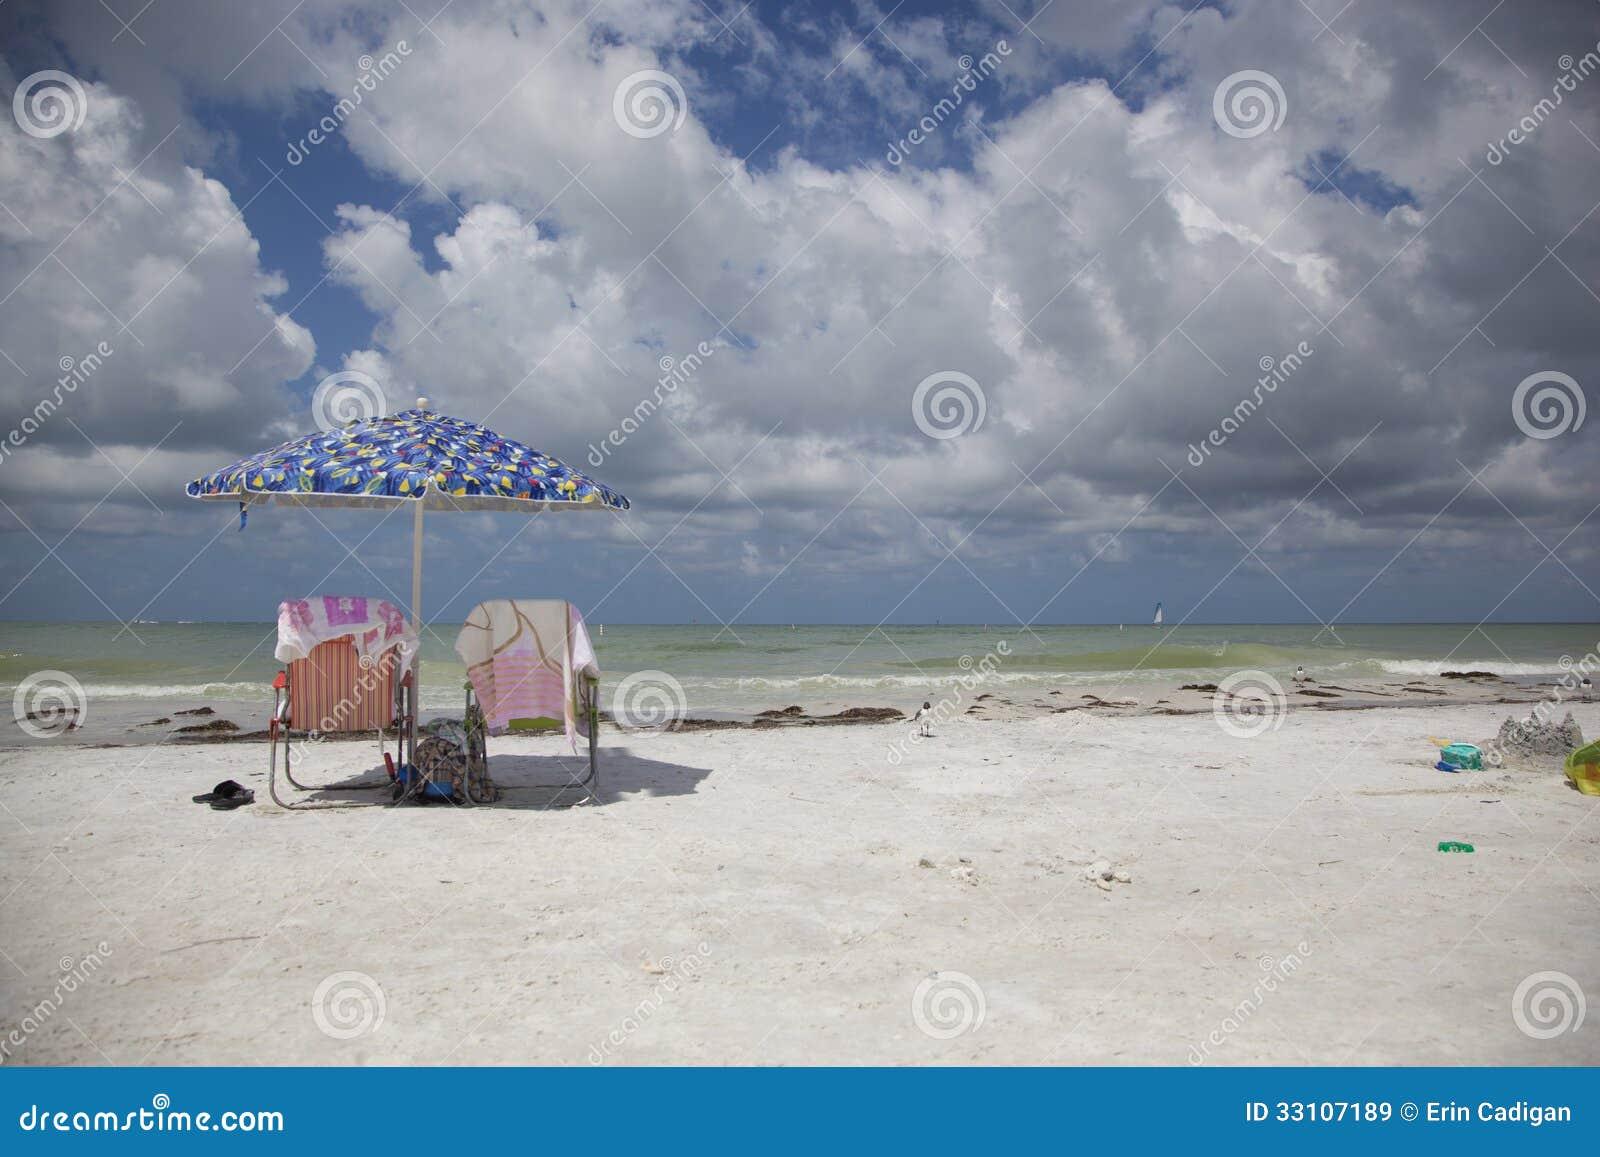 Parque estadual da ilha da lua de mel - Dunedin, Florida